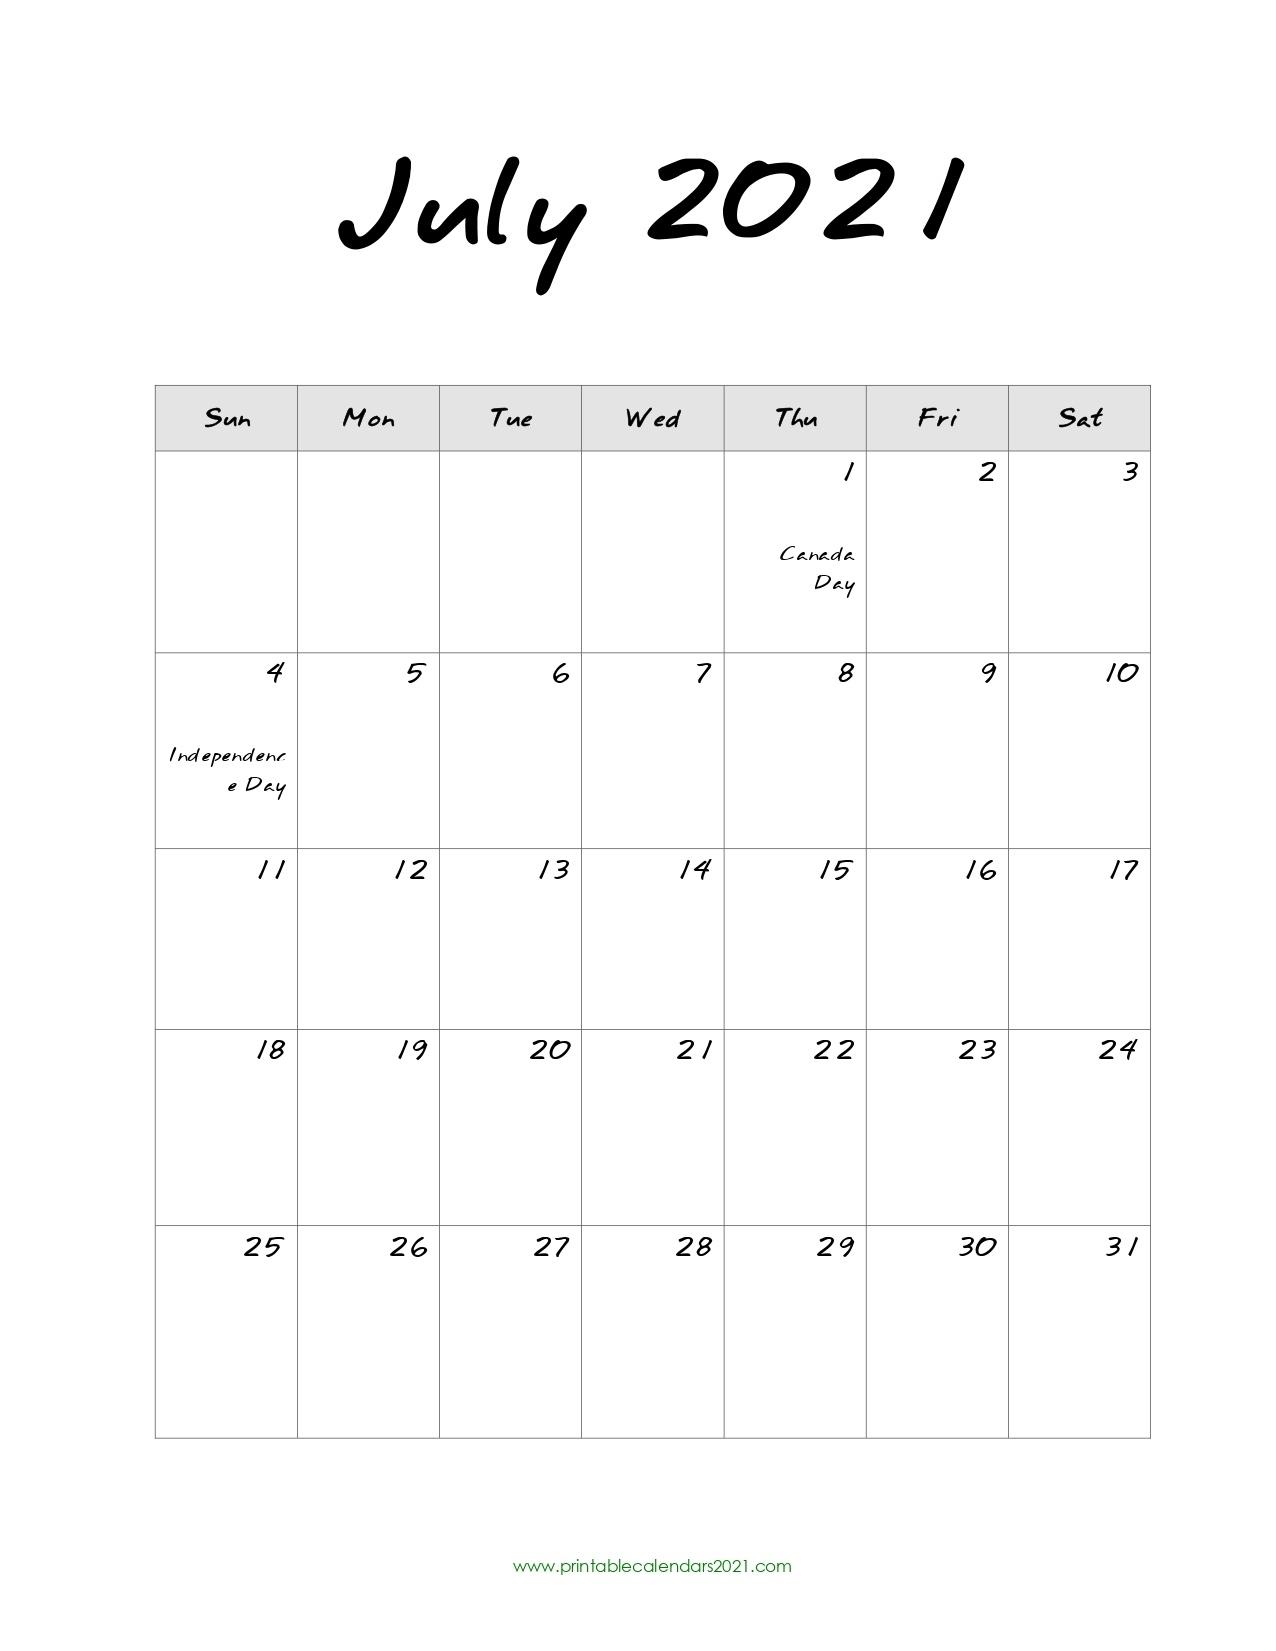 45+ July 2021 Calendar Printable, July 2021 Calendar Pdf, Blank, Free General Blue August 2021 Calendar